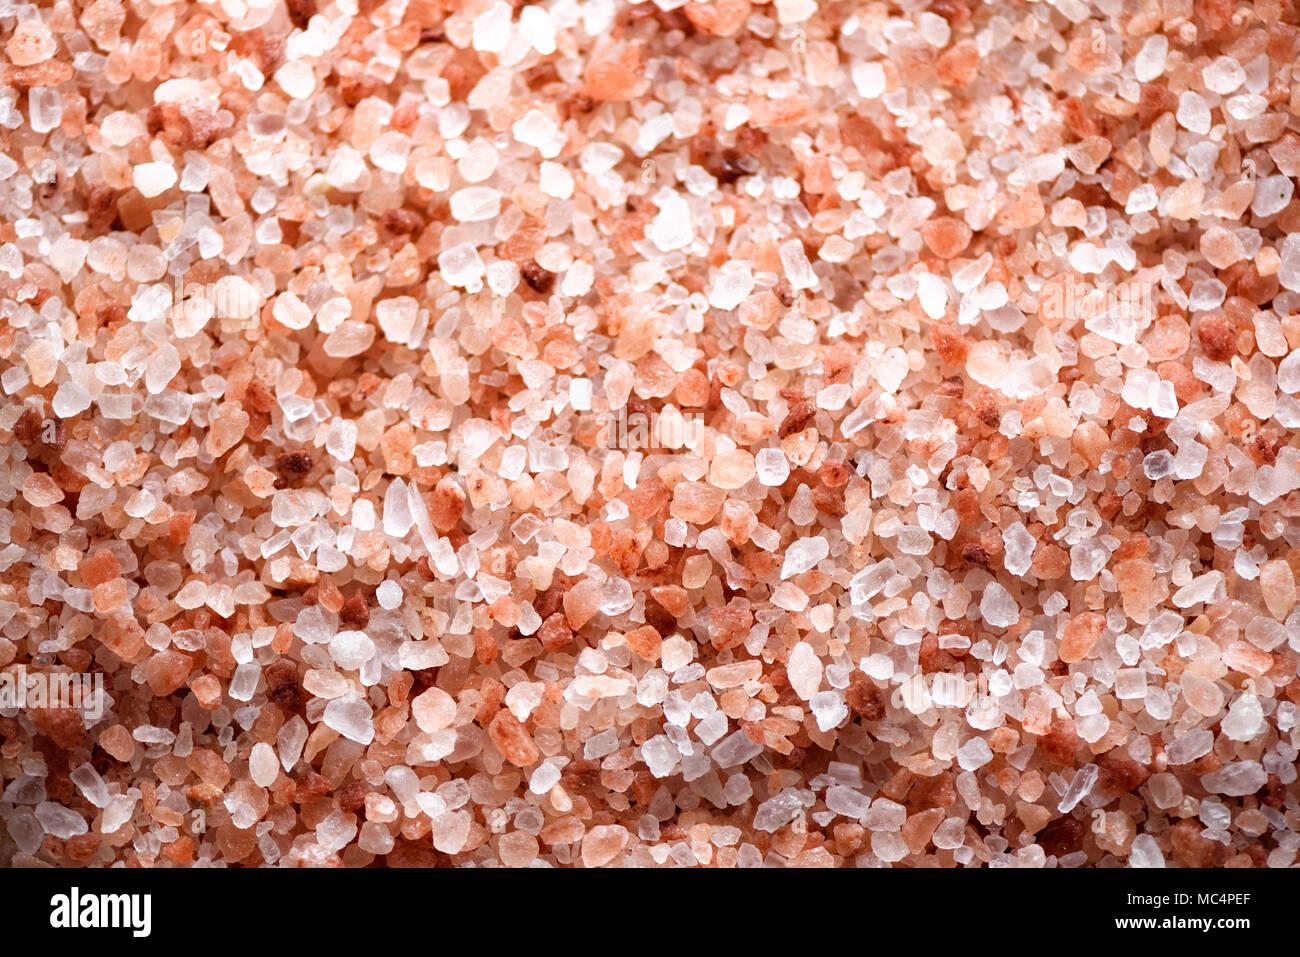 Rosa Himalaya-salz Hintergrund. Zutaten zum Kochen. Banner Stockbild